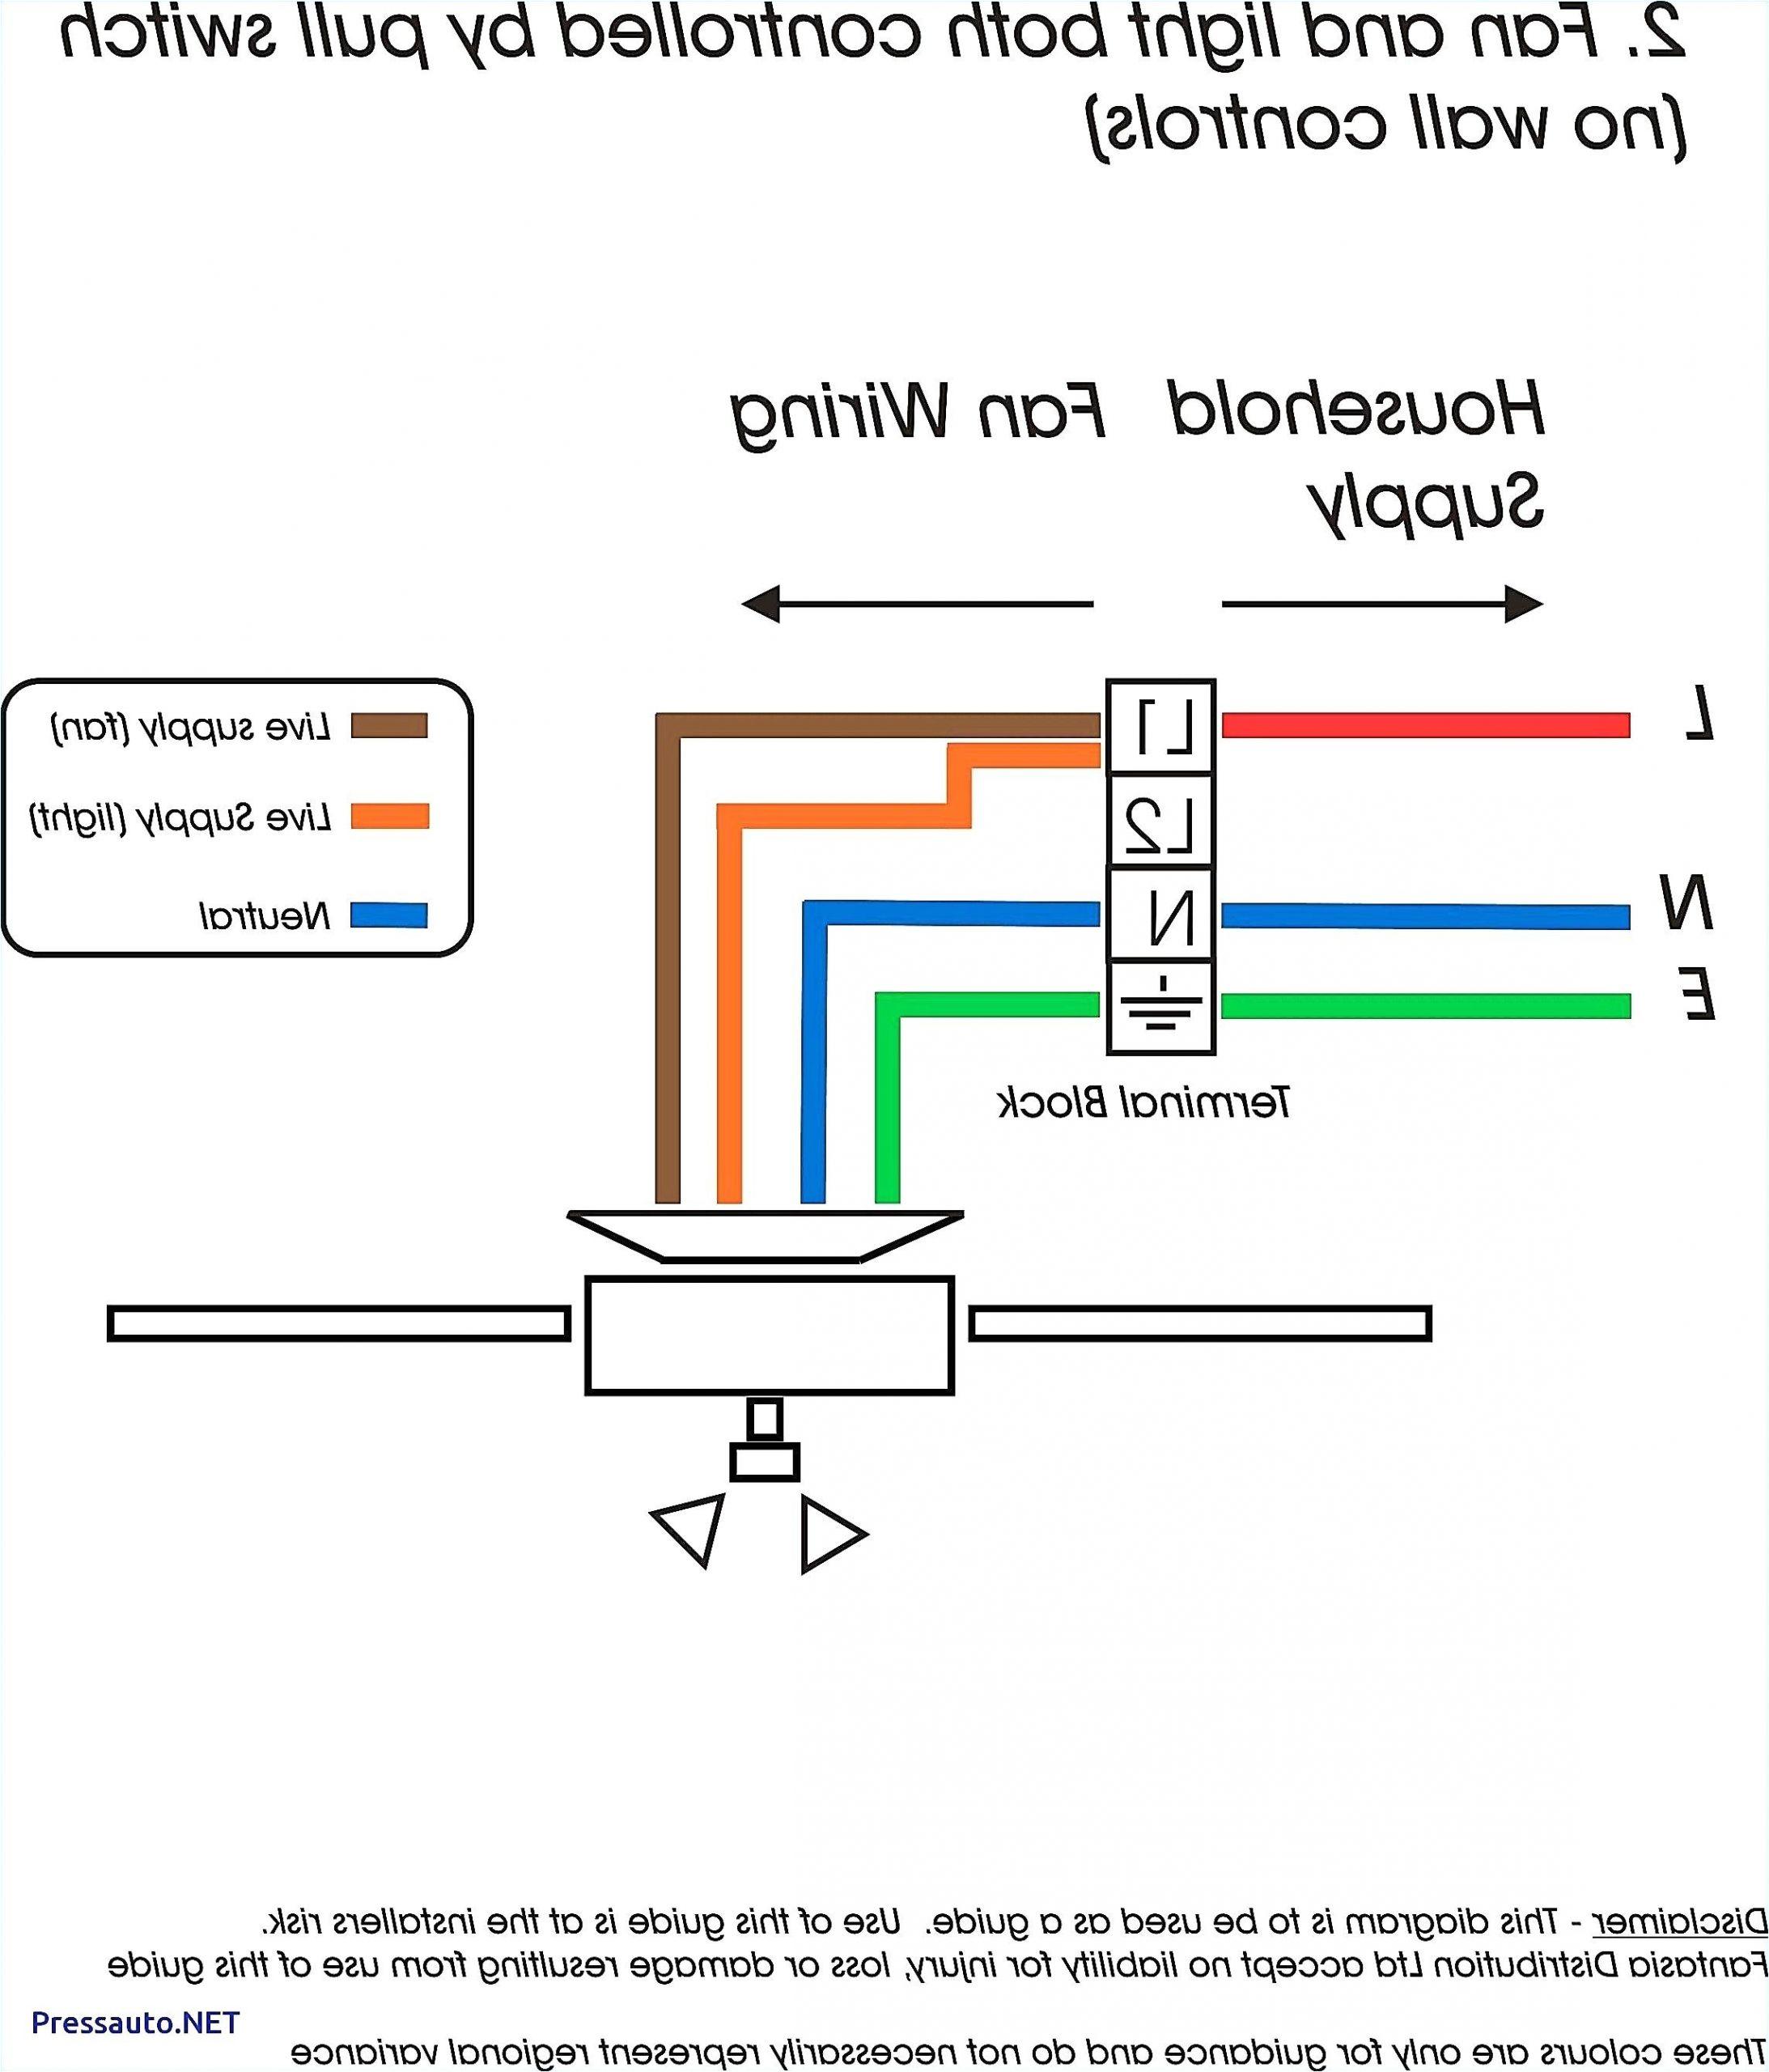 Bmw E46 Amplifier Wiring Diagram Rb 2090 E46 Amplifier Wiring Diagram